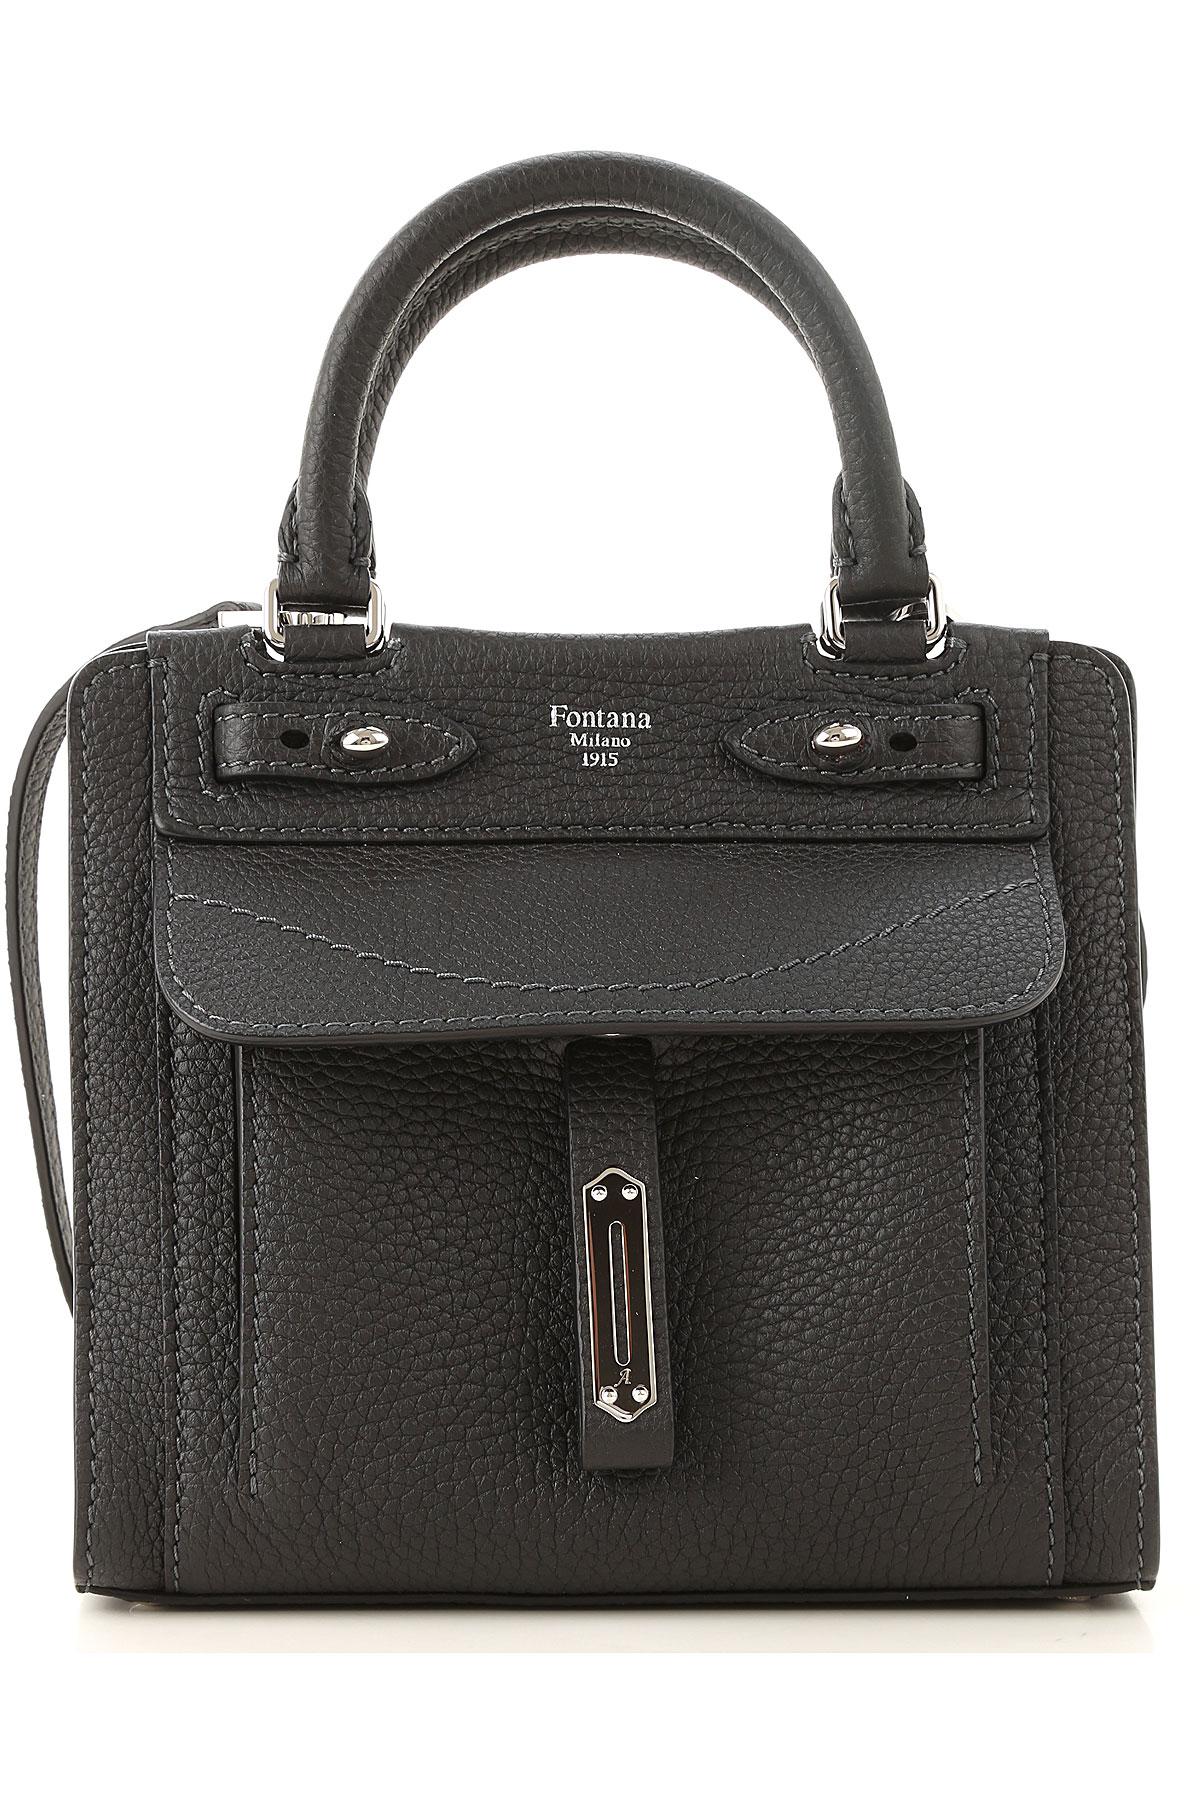 Fontana Top Handle Handbag, Black, Crackle Leather, 2019